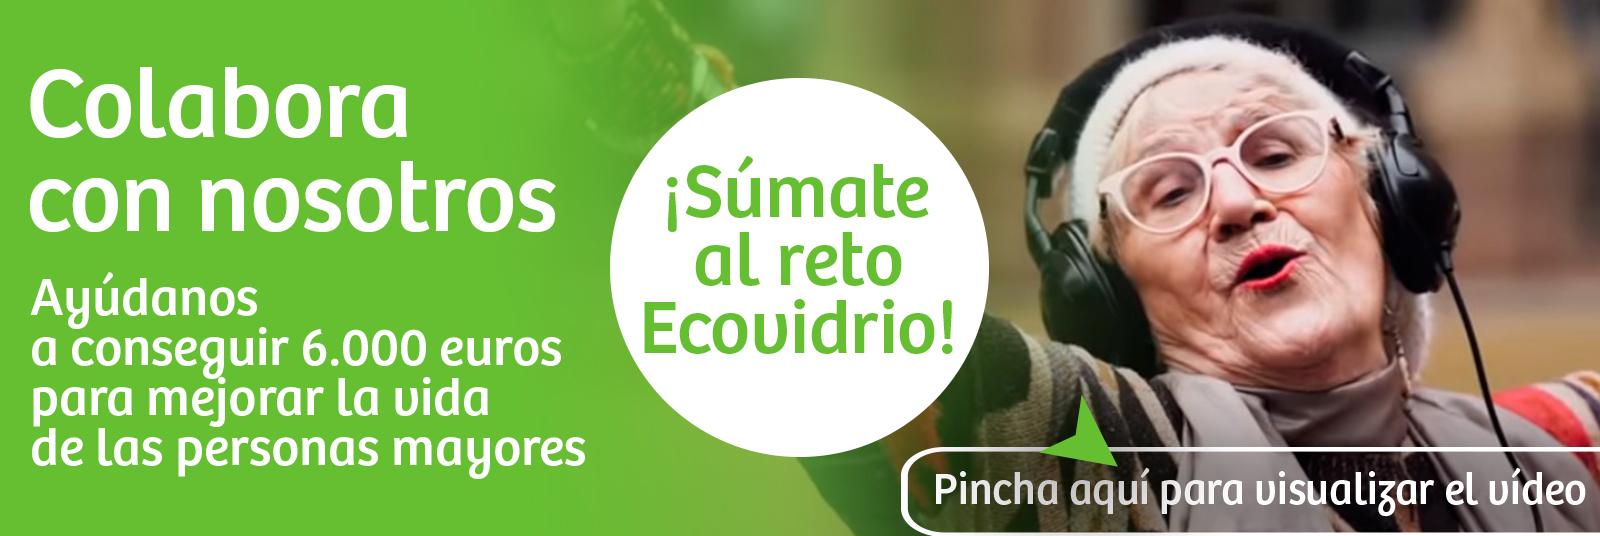 Reto-ecovidrio—Banner